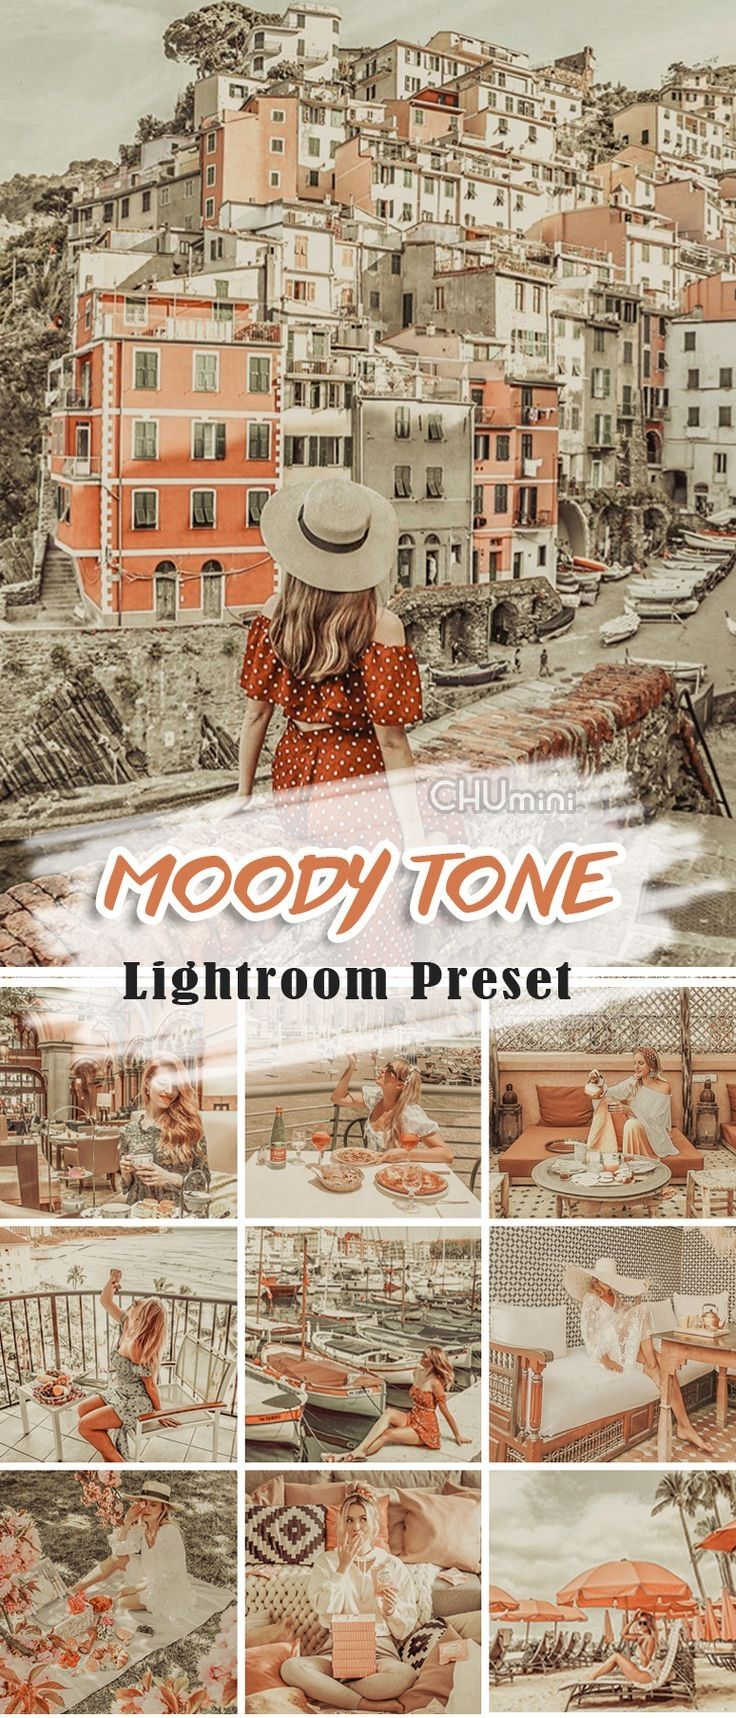 Moody Tone Lightroom Preset Lightroom Presets Tutorial Lightroom Chumini Fo In 2020 Lightroom Presets Tutorial Photo Editing Lightroom Vintage Lightroom Presets